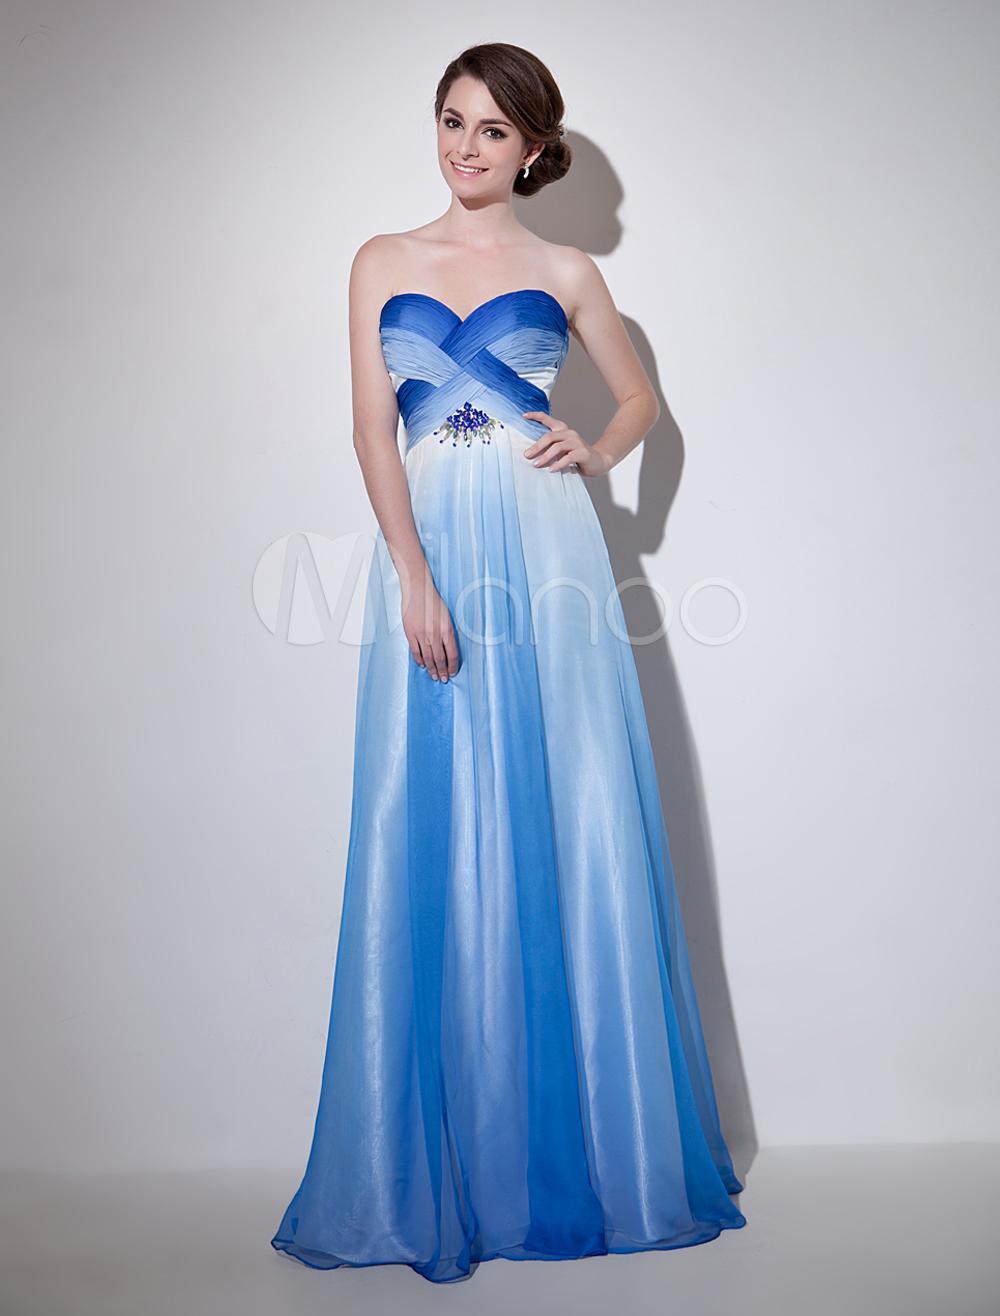 Royal Blue Sweetheart Neck Beading A-line Chiffon Evening Dress Milanoo (Wedding Evening Dresses) photo